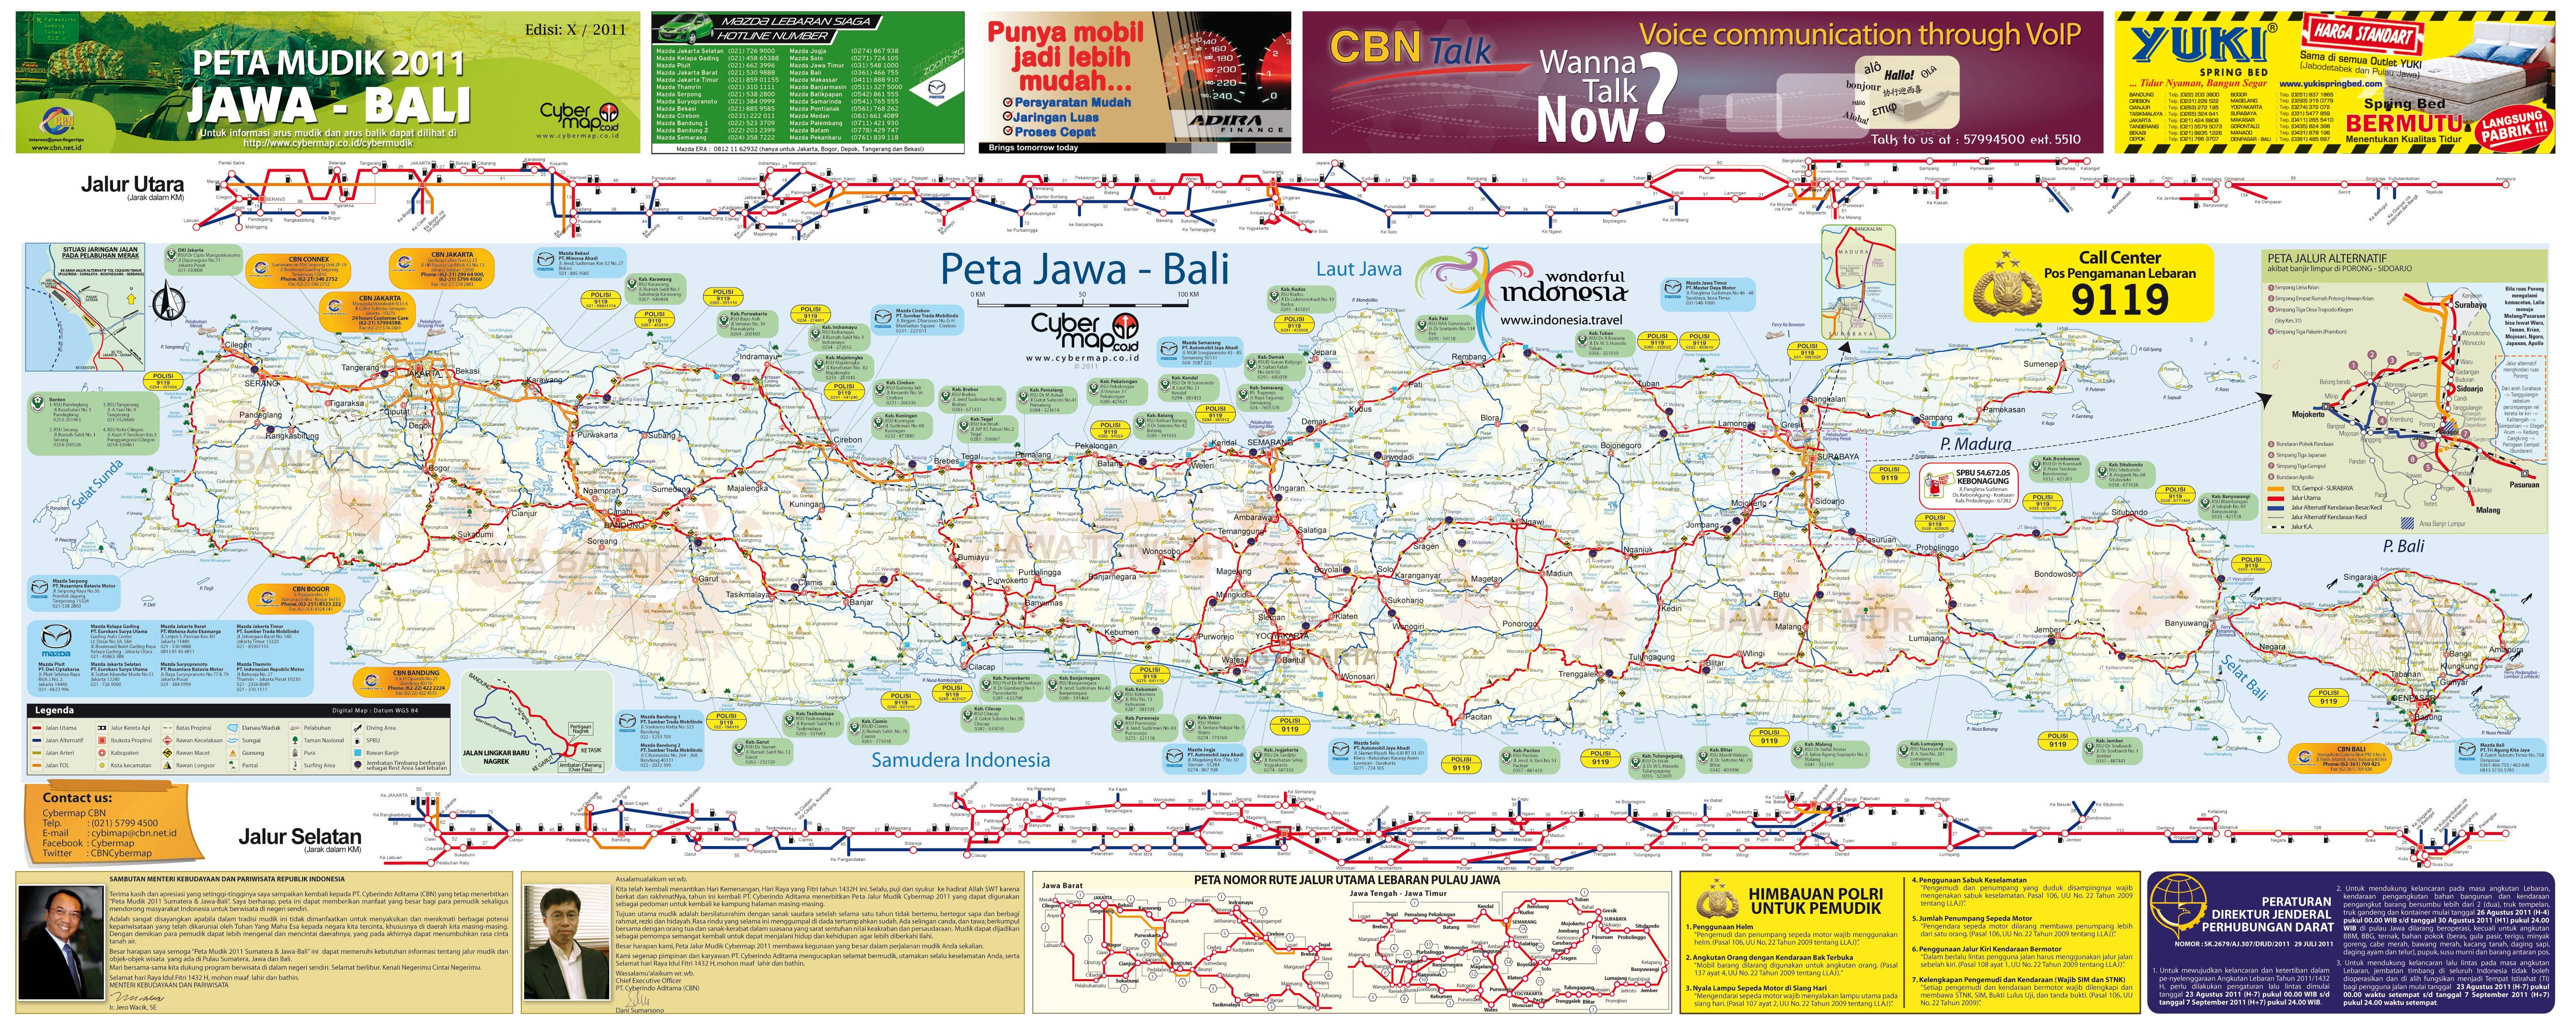 Peta Mudik Jawa – Bali 2011 ( PDF | JPG )